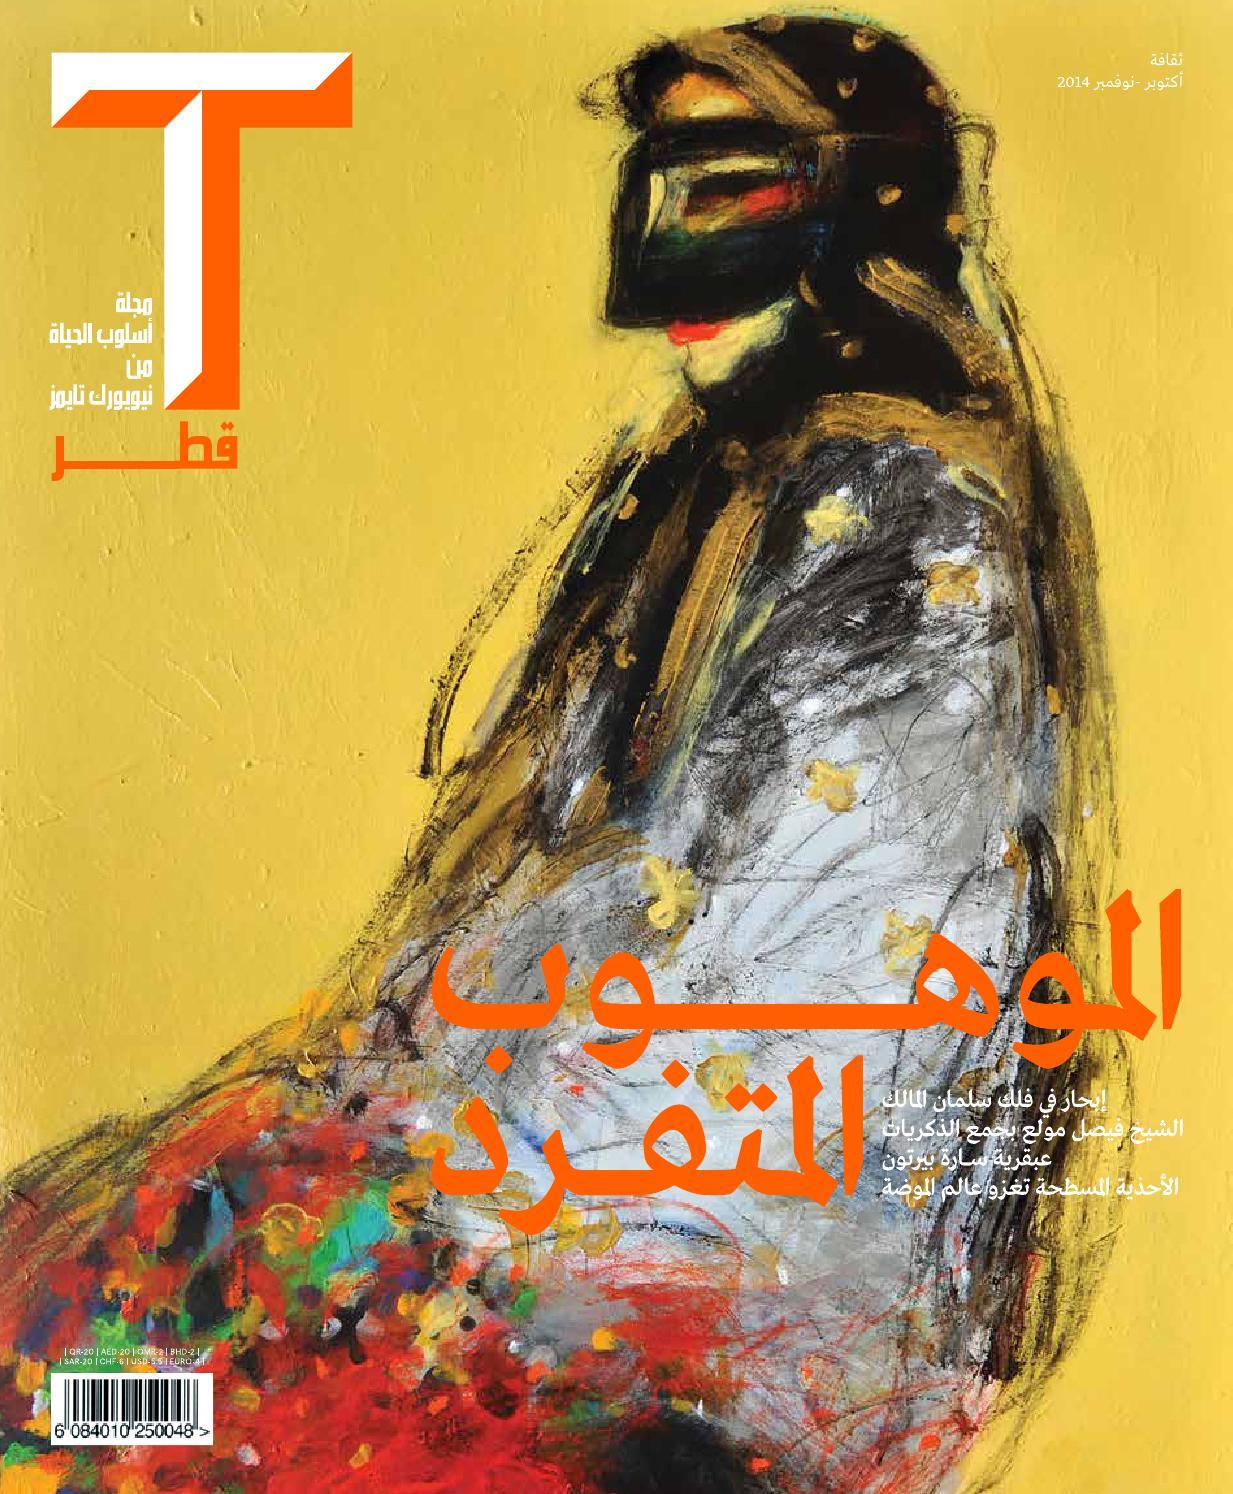 7beb26ed8 T qatar arabic by Oryx Group of Magazines - issuu